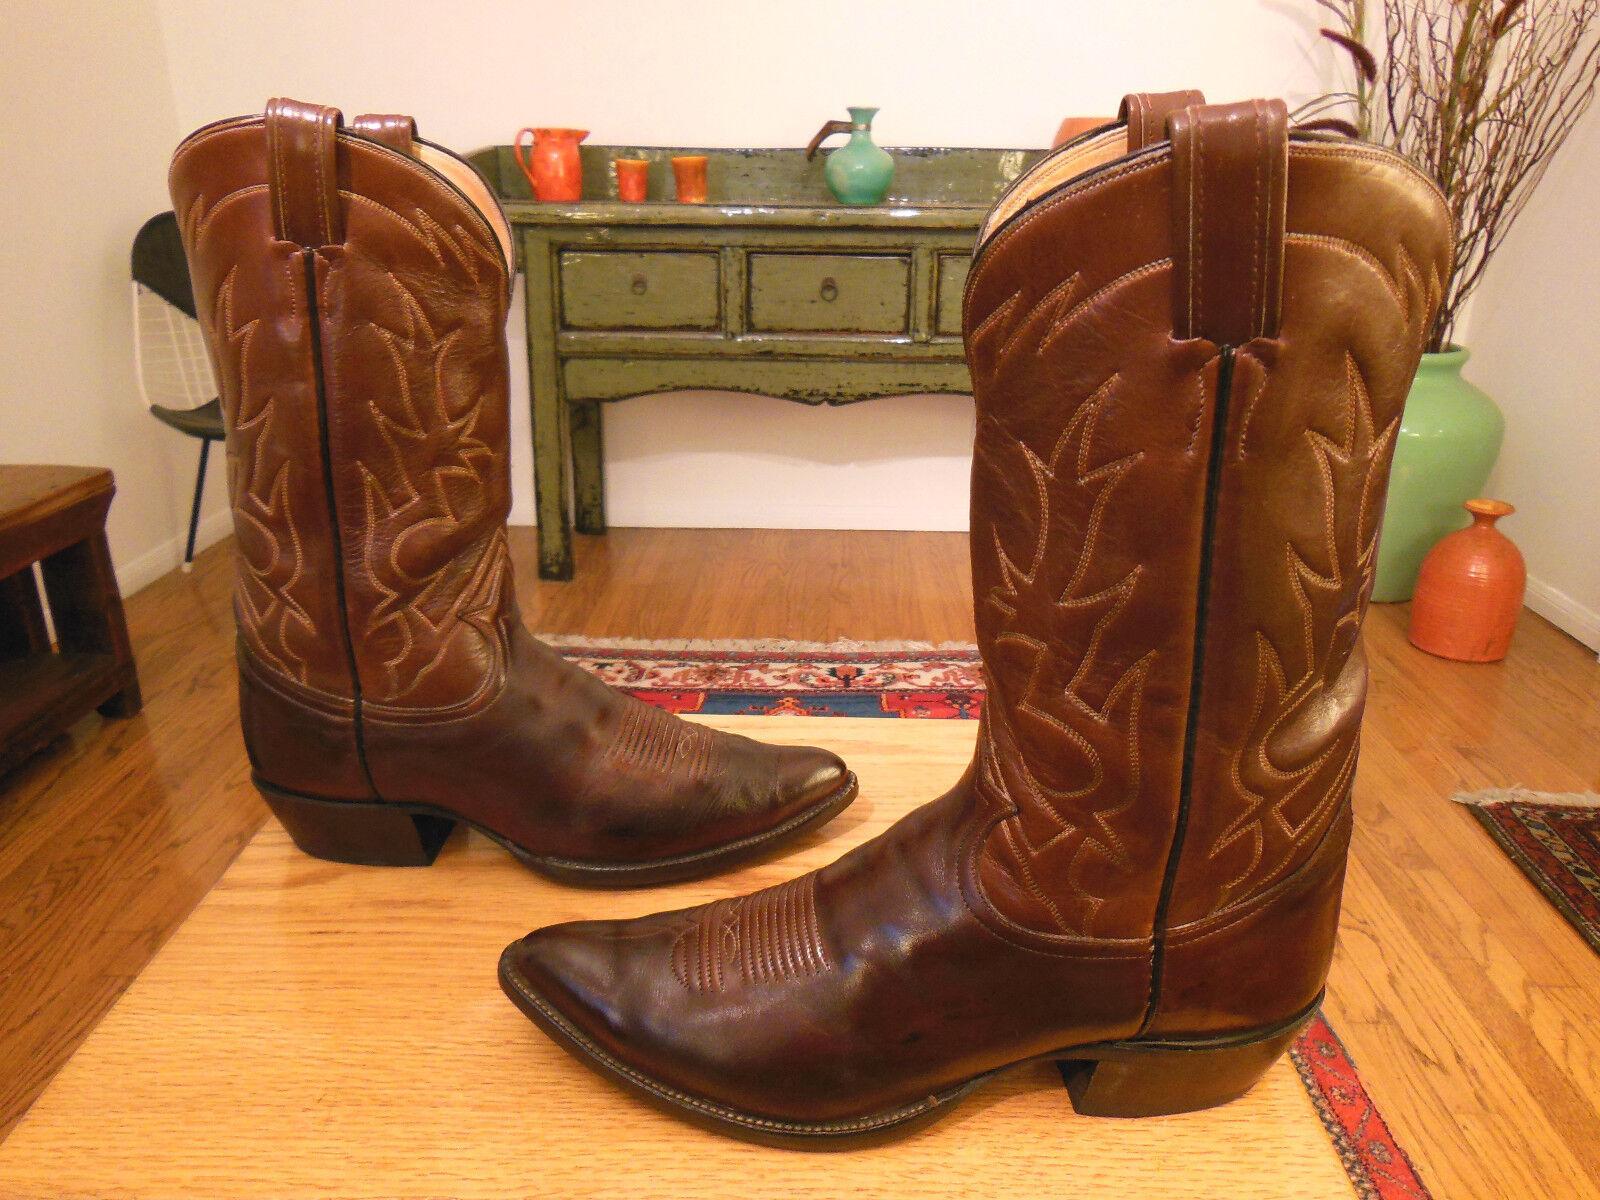 Vtg 70s/80s Brown/Med. TONY LAMA Dk. Brown/Med. 70s/80s Brown Pelle Western Cowboy Stivali 10B  A 89bd27